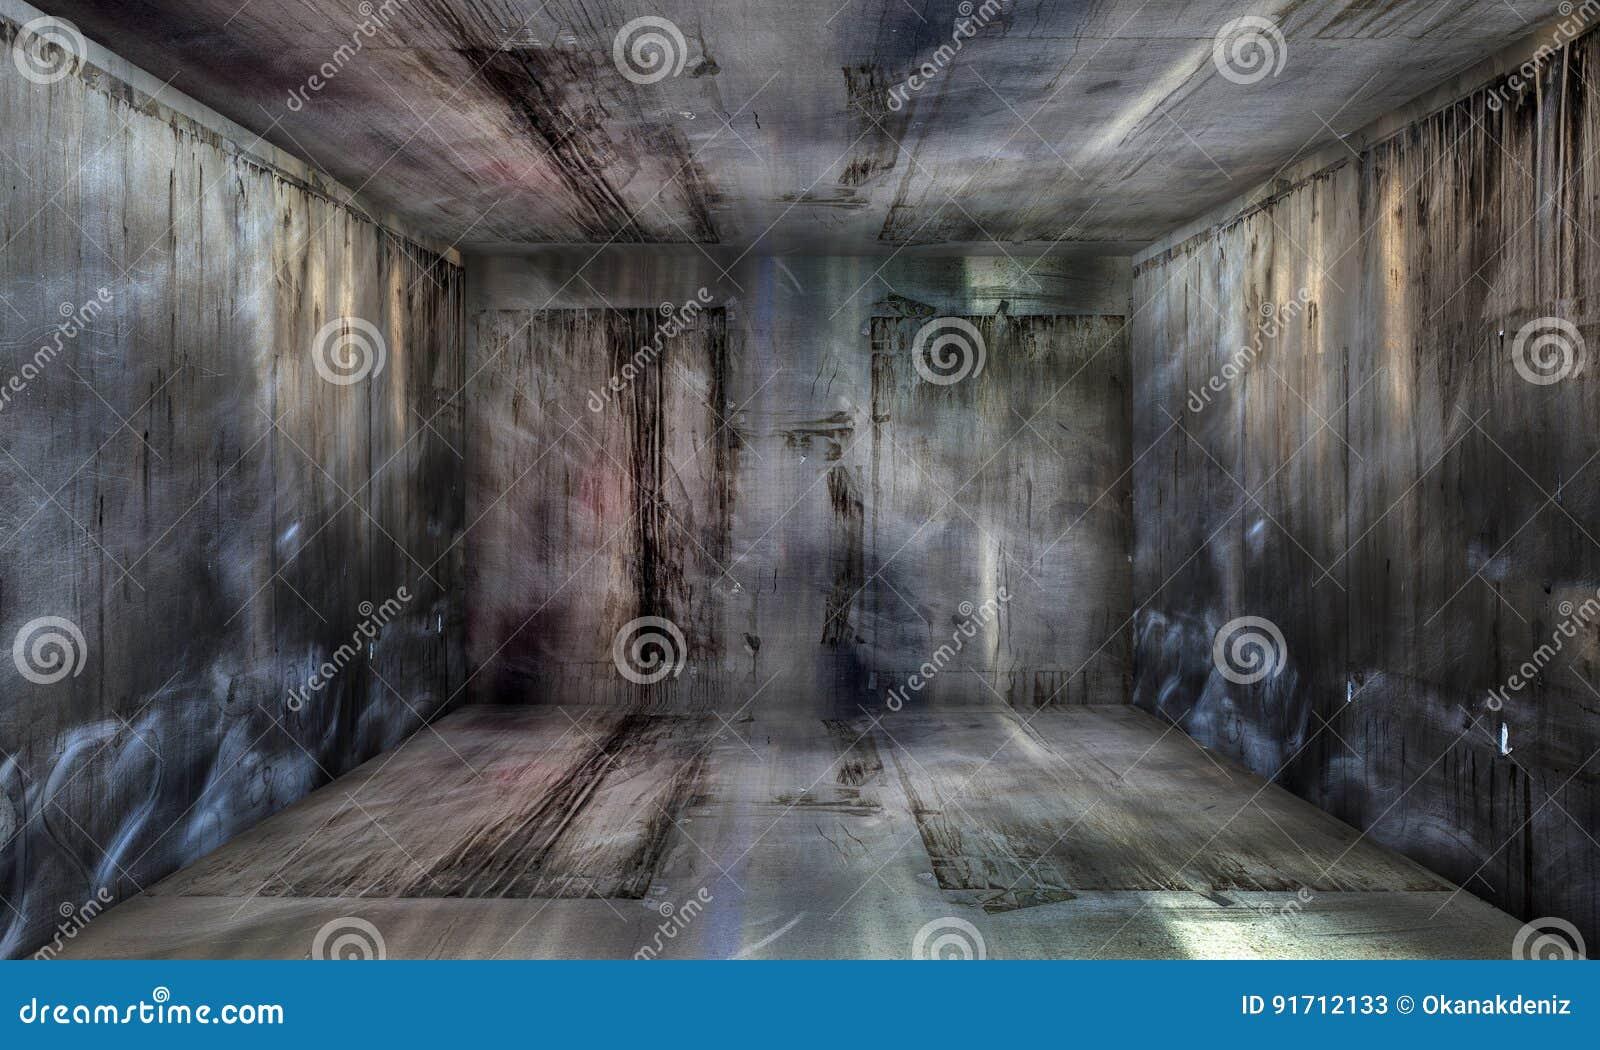 Grunge Abstract Urban Metallic Room Stage Background